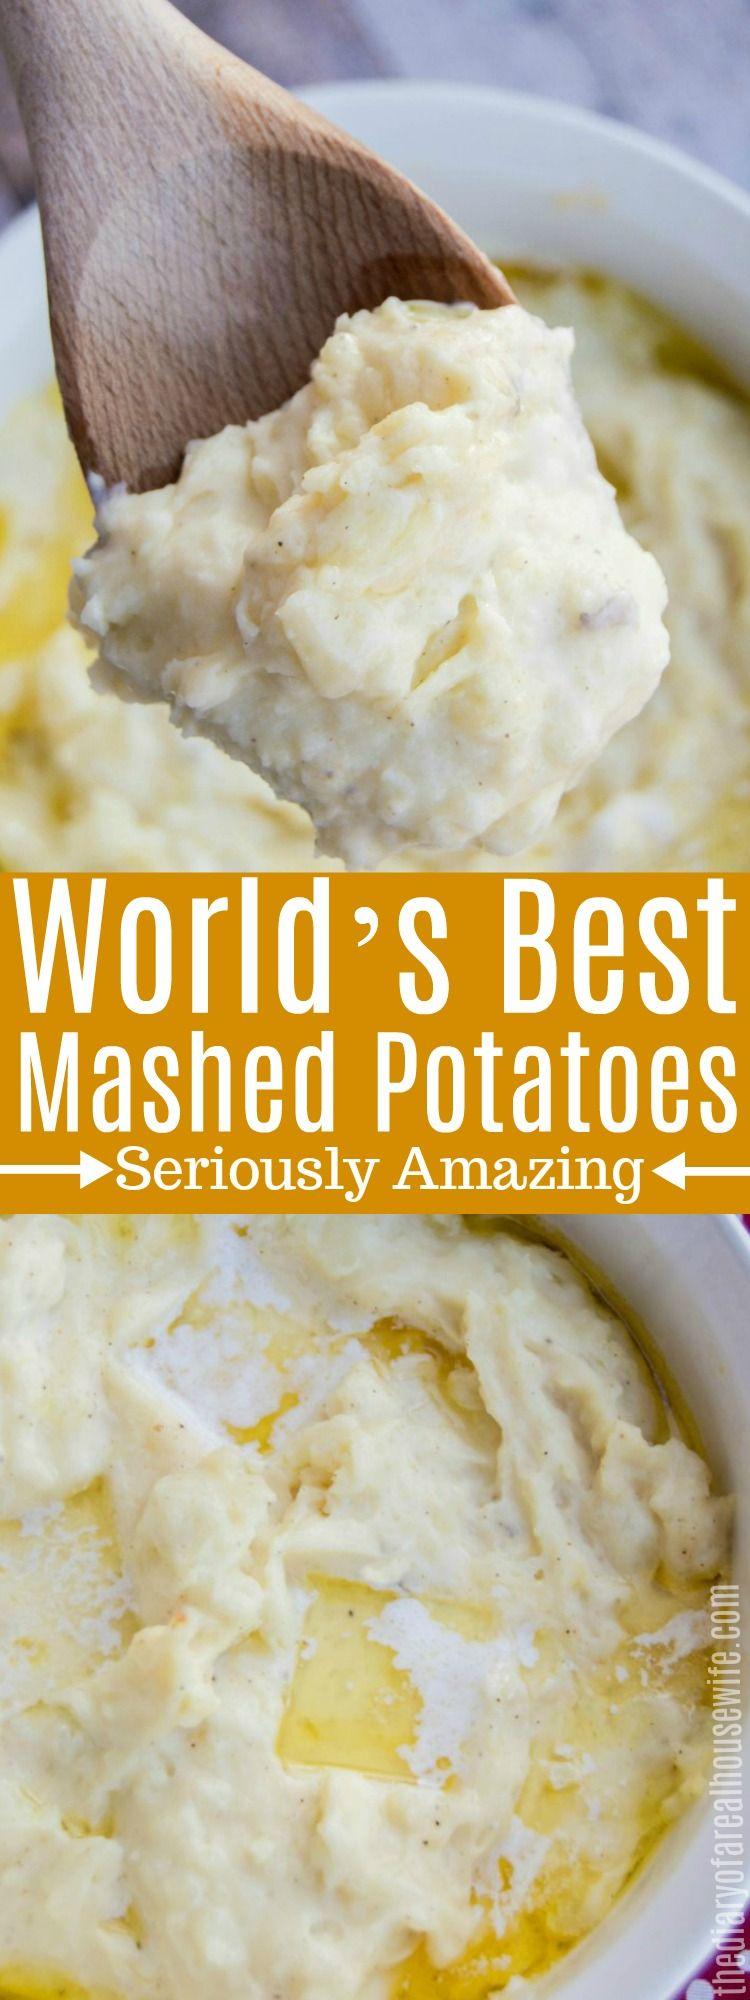 The World's Best Mashed Potatoes, the best thanksgiving side dish recipe. #thanksgiving #sidedish #russetpotatorecipes